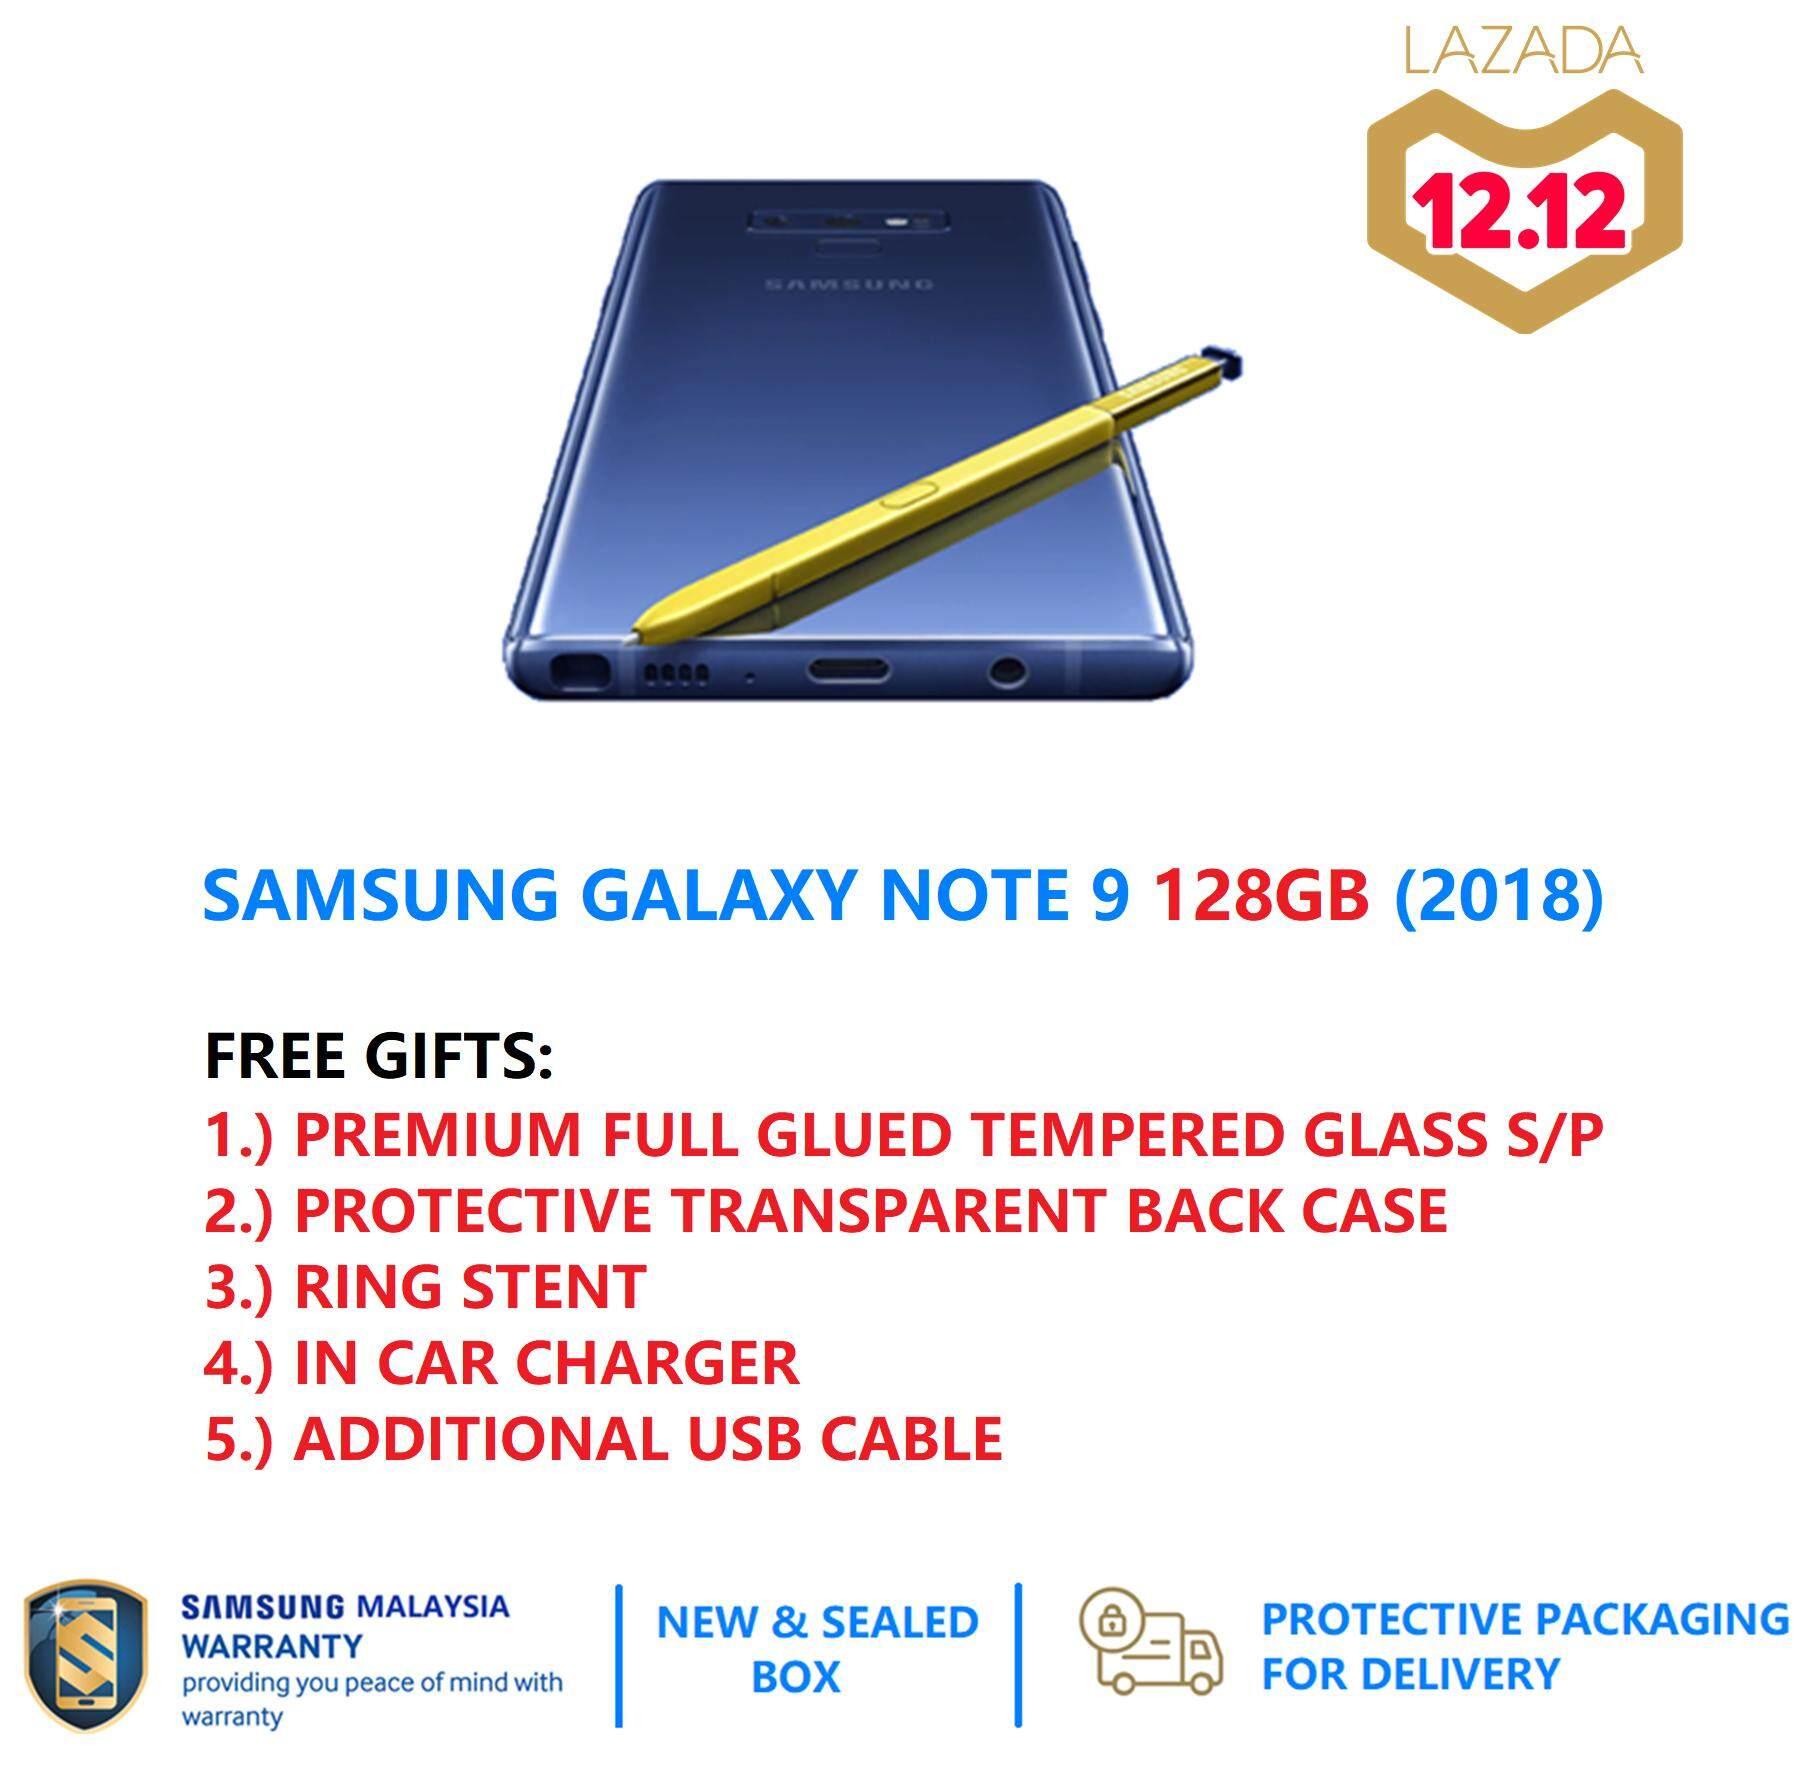 Grab Original Samsung Mobiles Tablets On Lazada My Xiaomi Redmi Note 2 4g Lte Dual Simcard Ram 1gb Internal 8gb Free Shipping Galaxy 9 128gb Sim 6gb